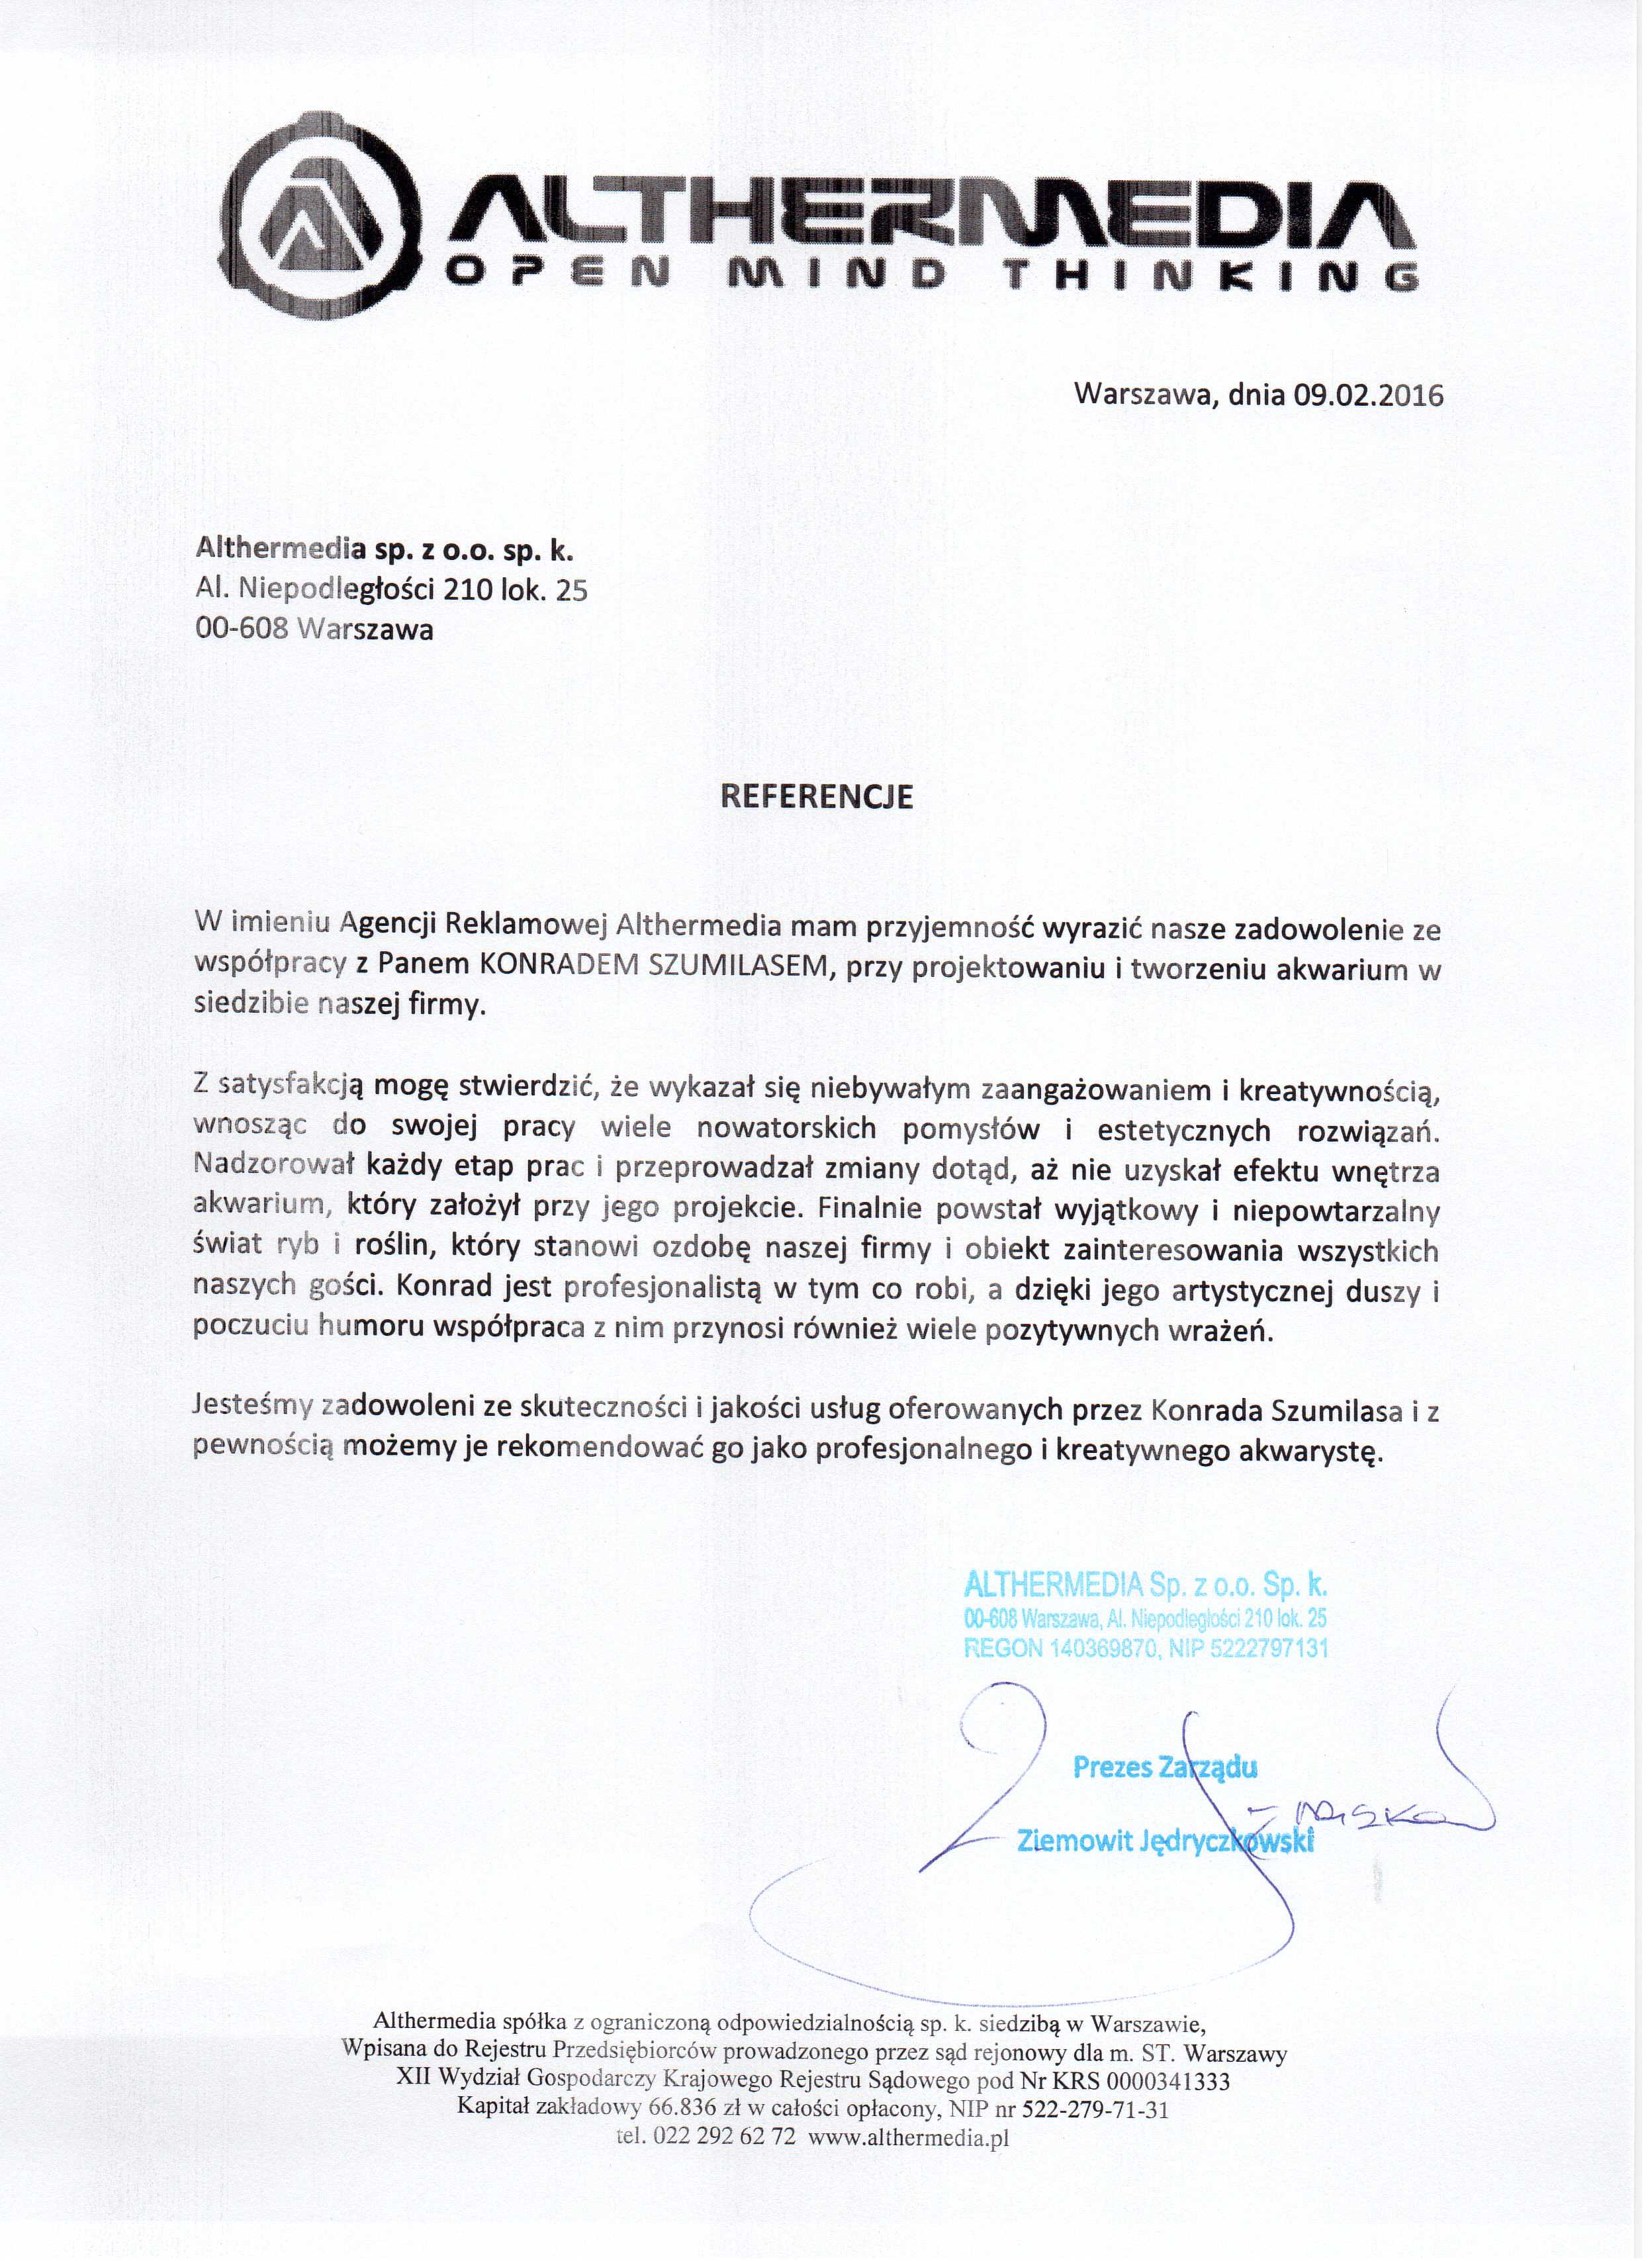 Referencje - Konrad Szumilas - Althermedia 2016.jpg